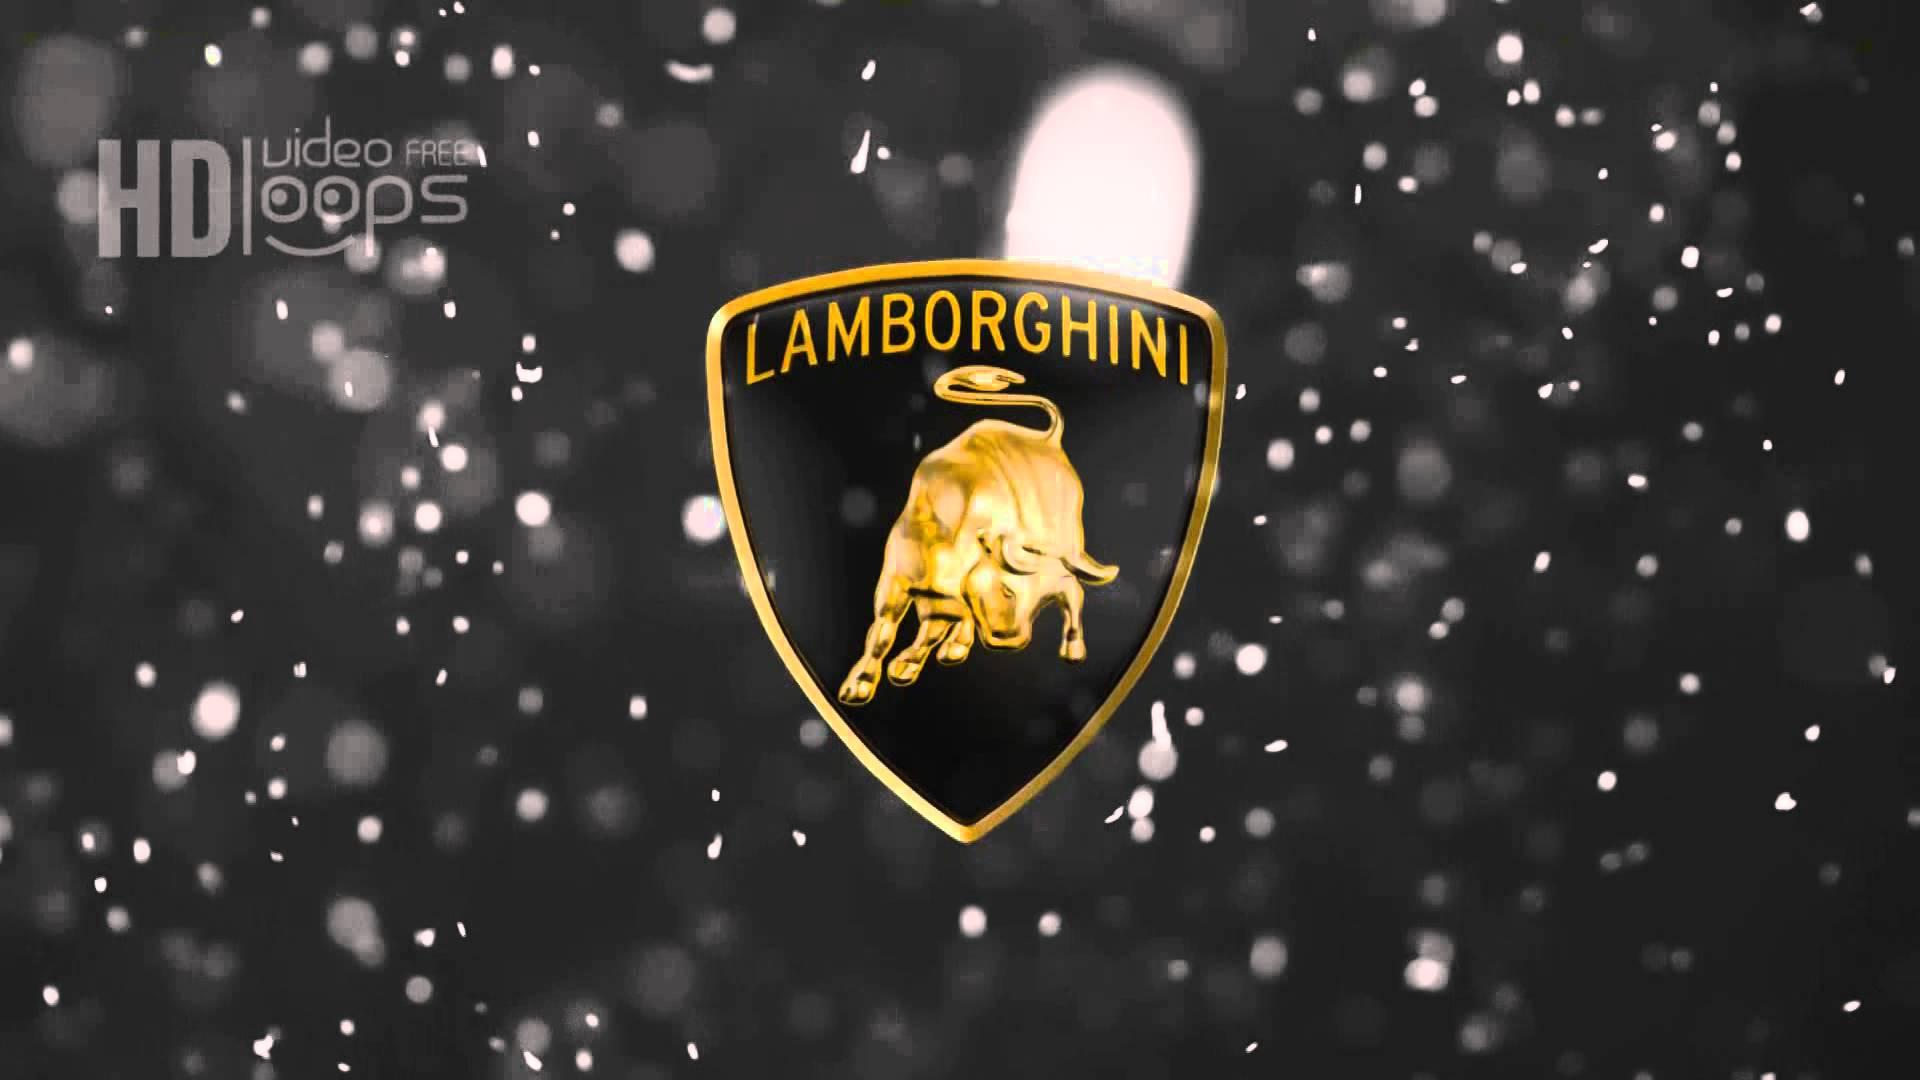 Lamborghini Logo Wallpapers Wallpaper 1920x1080